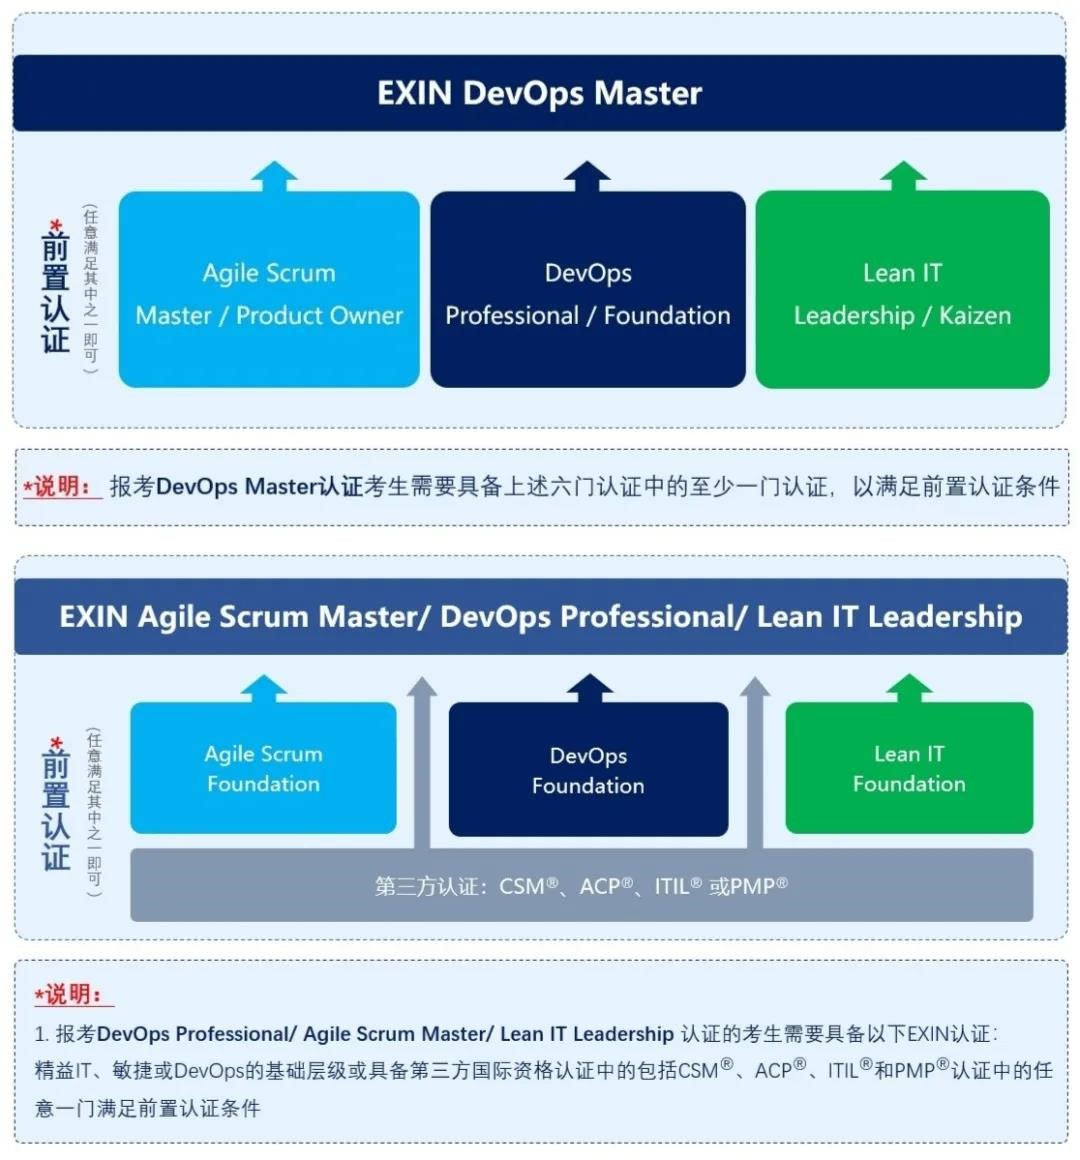 《EXIN DevOps、敏捷及精益中高级考试前置认证规则》正式发布 -- 第1张